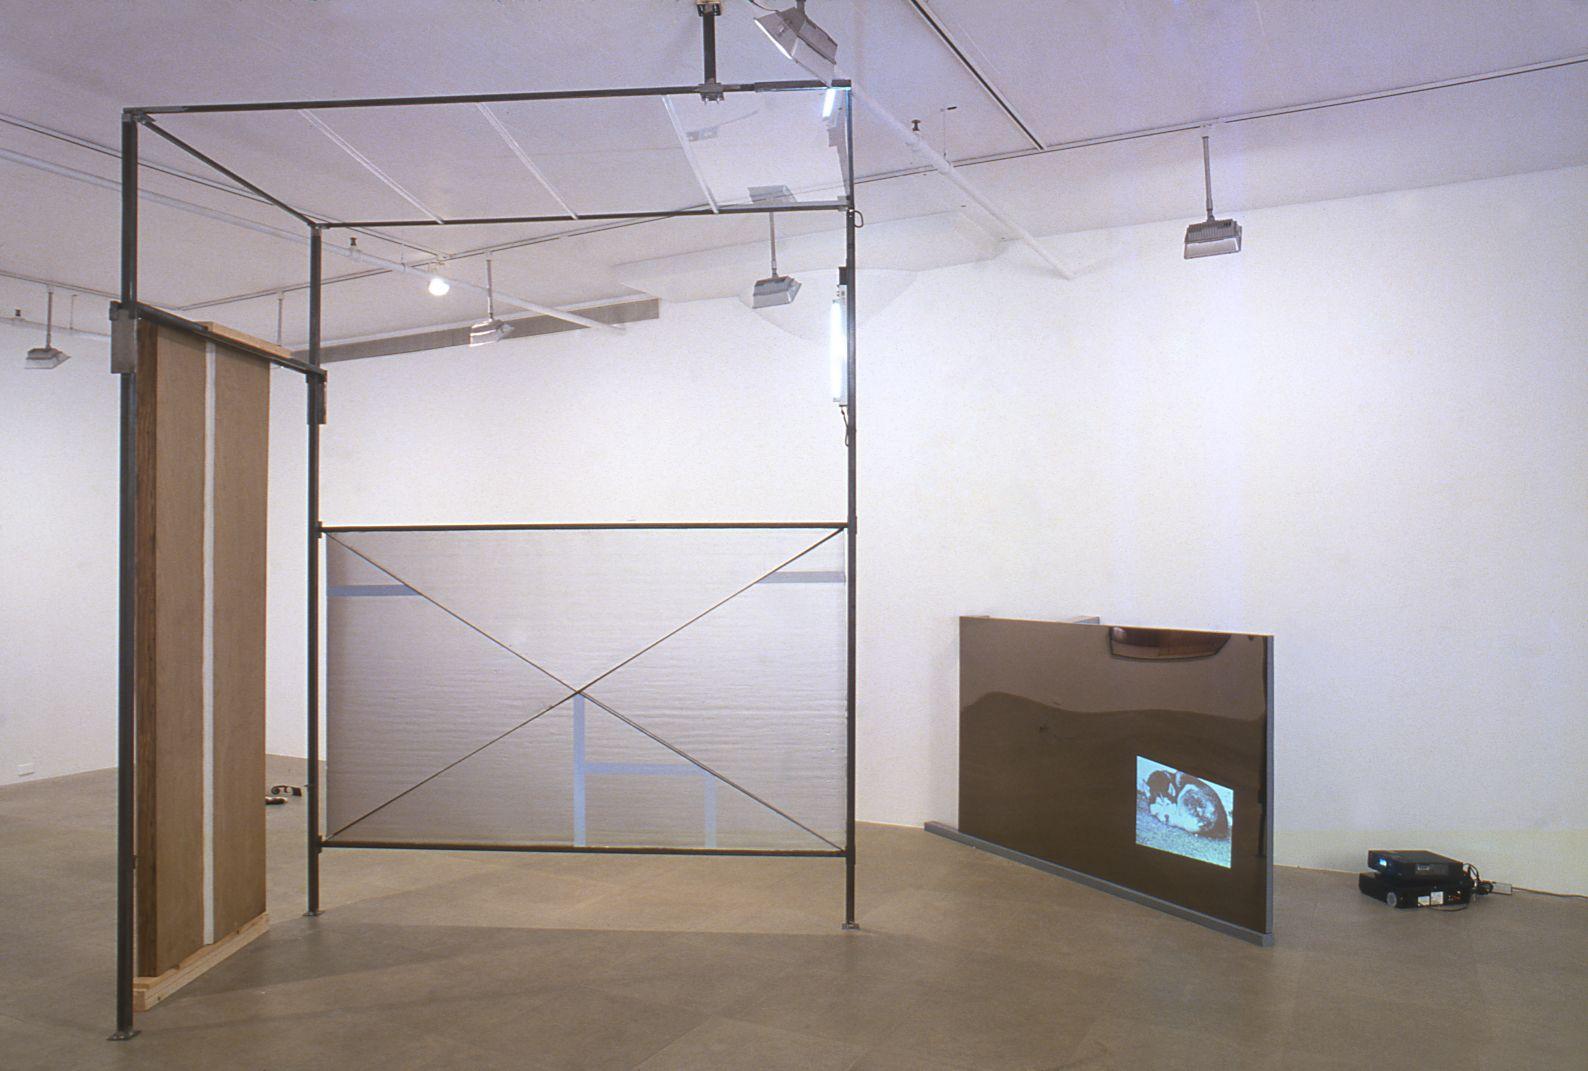 Heidie Gianotti, When Suburban Living Was Good, 2001, Steel, plexi, insulation, caulking, vinyl, super 8 film, Dimensions variable